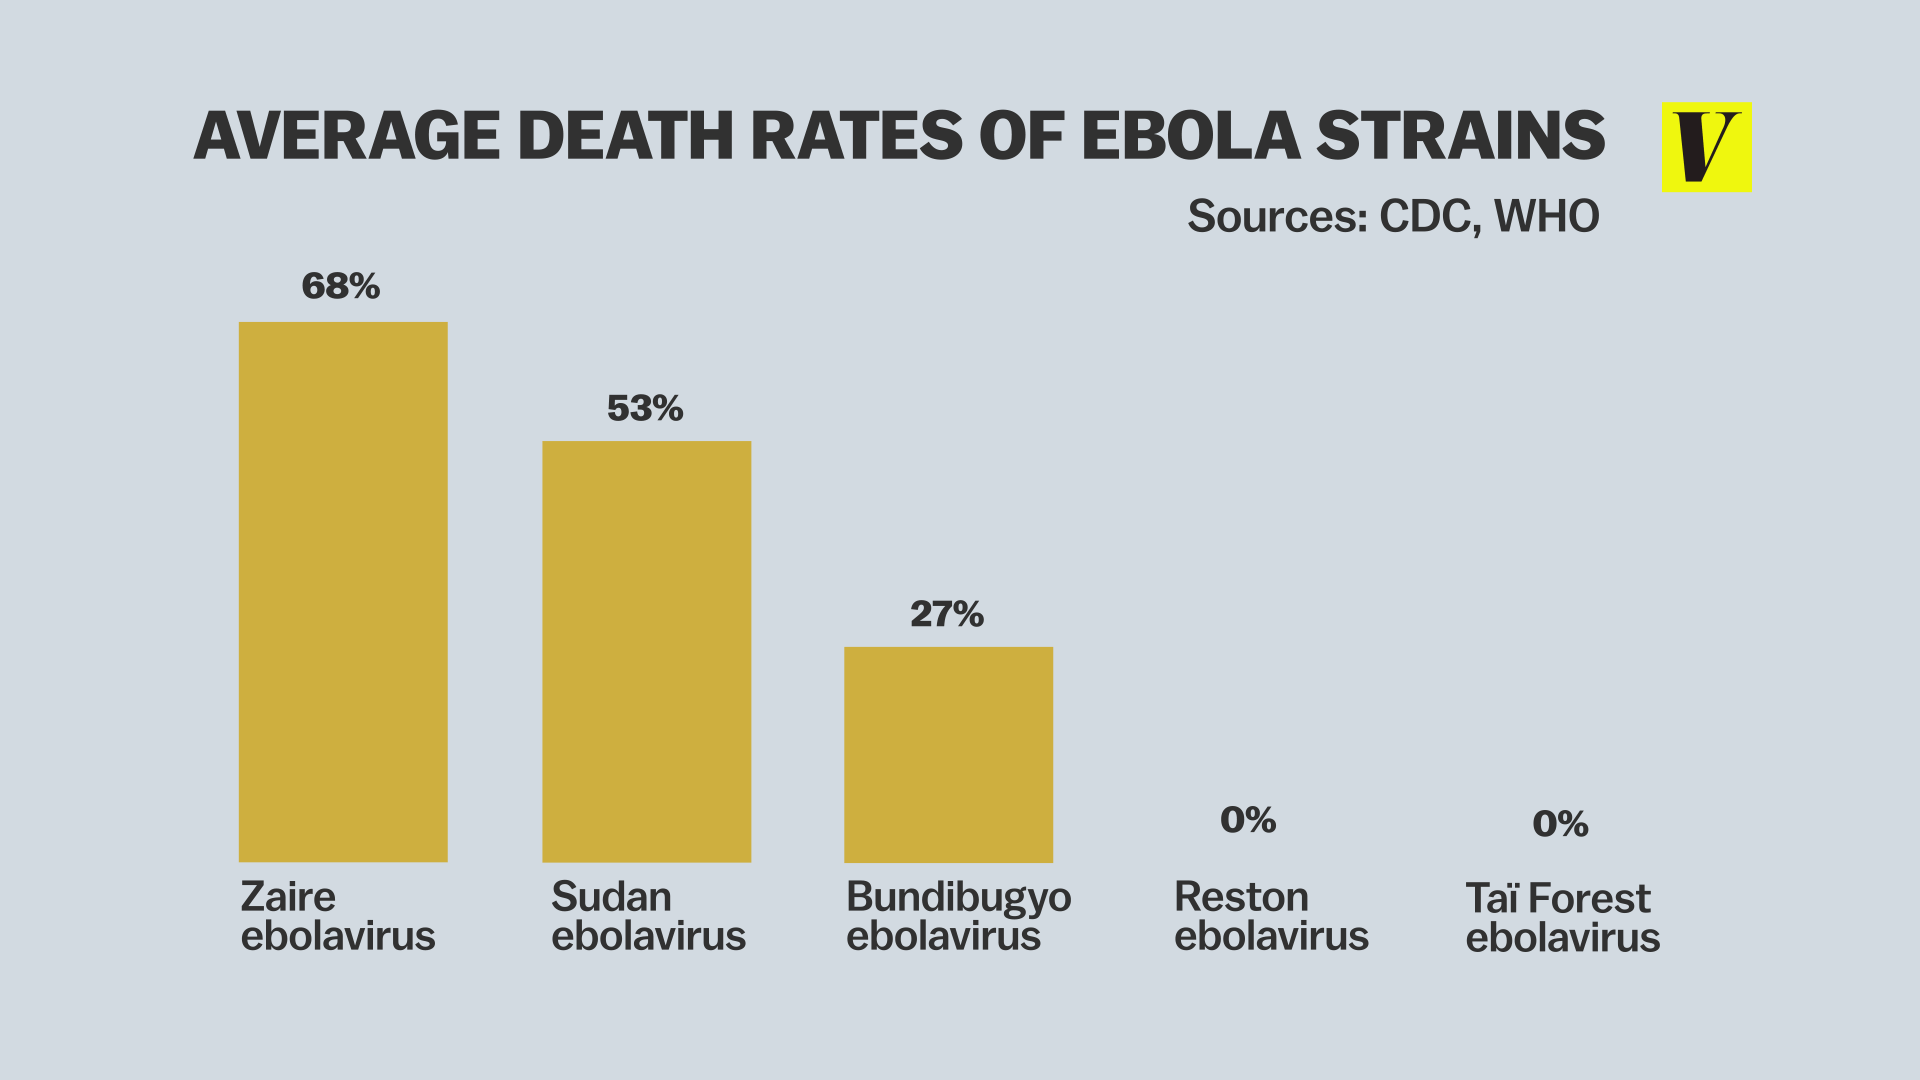 Deadliness of Ebola Strains